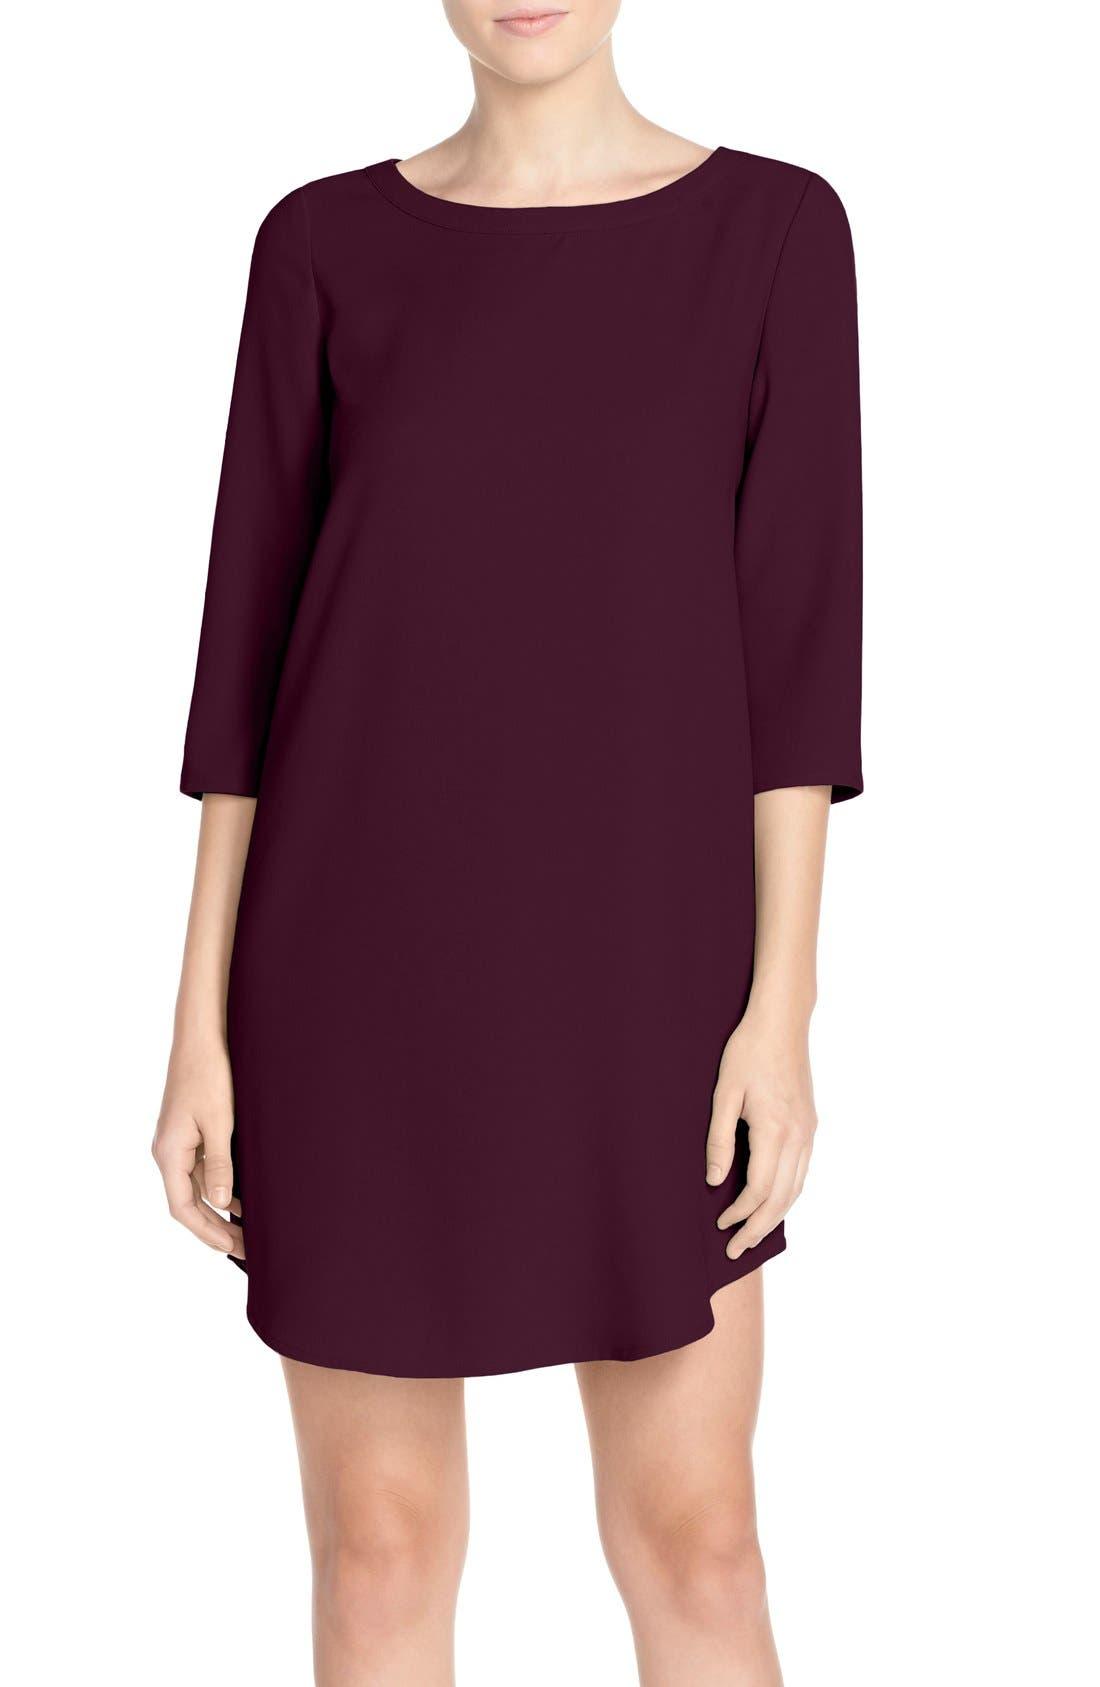 BB Dakota 'Jazlyn' Crepe Shift Dress